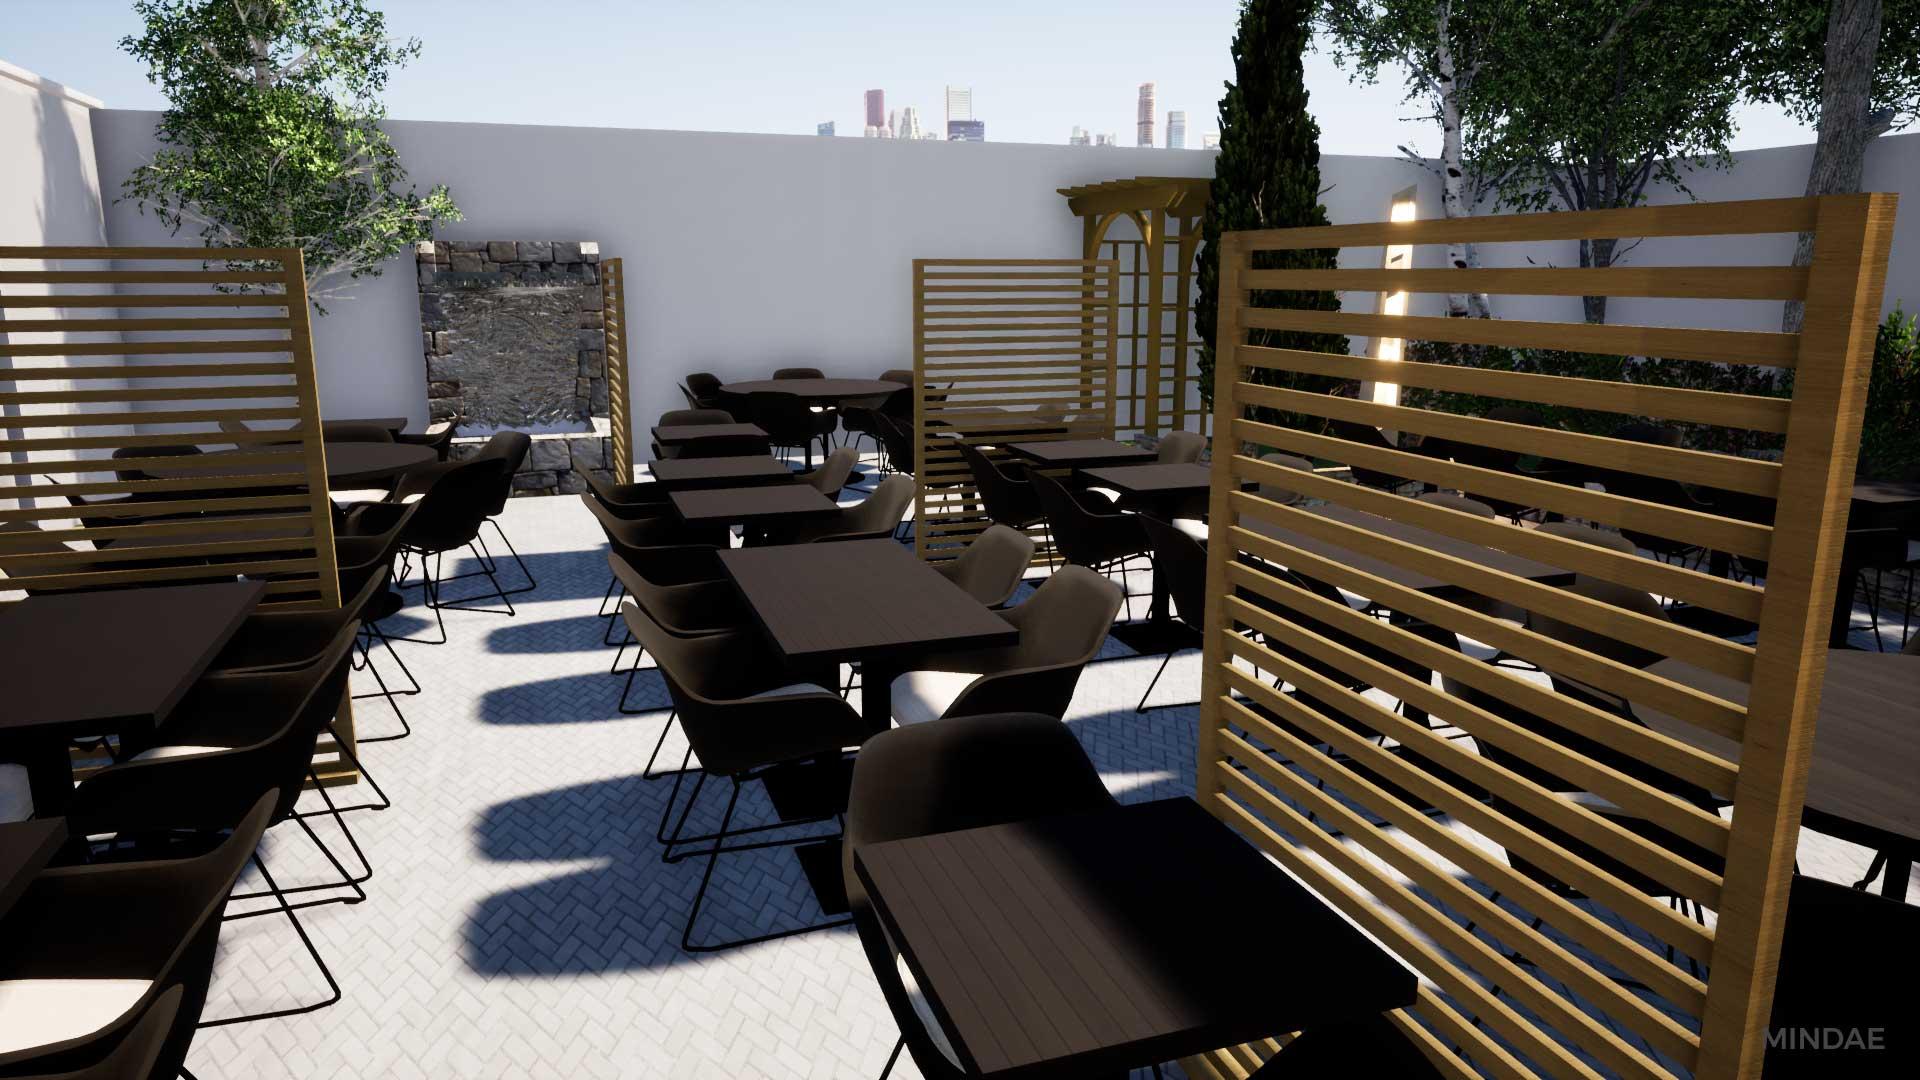 Mindae_3D_restaurant_caen_republique_agencement_bois_terrasse_comptoir-(4)